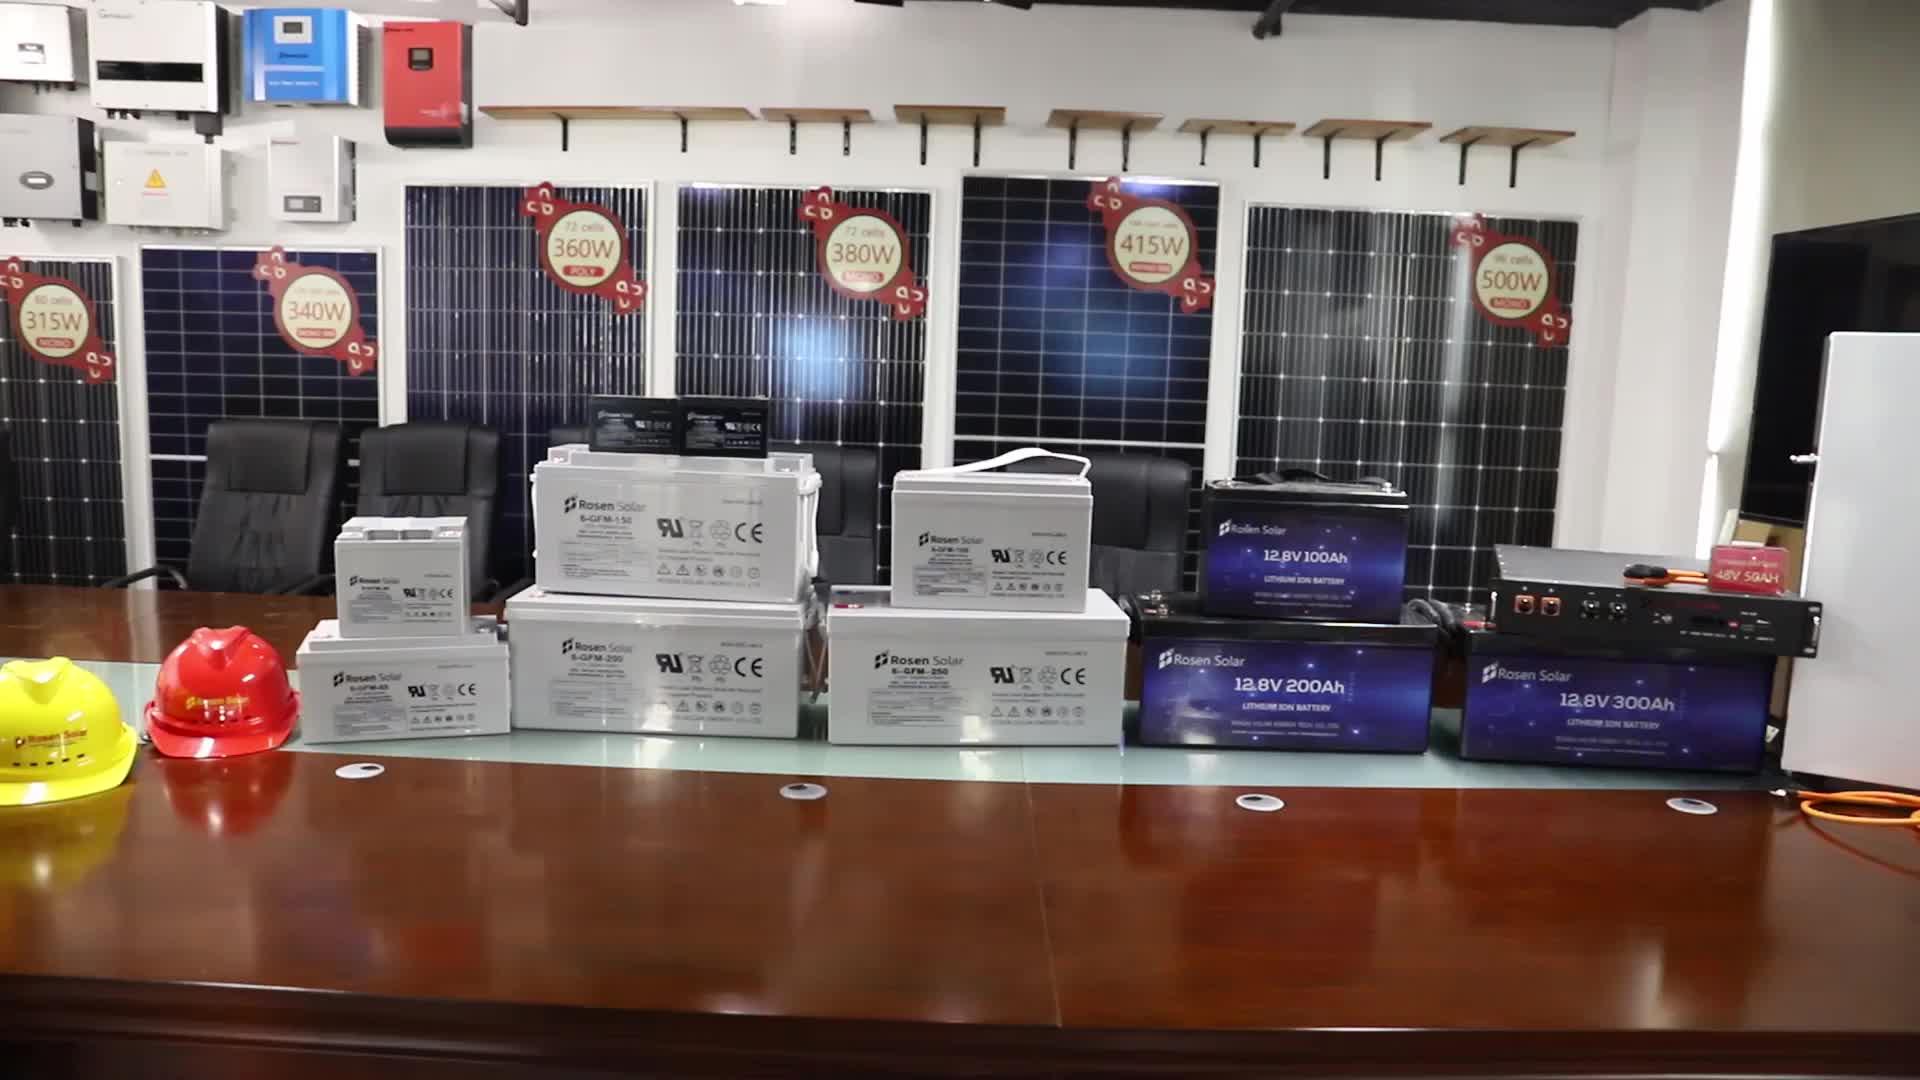 Rosen 400w painel solar mono 450w 500w painel solar para energia solar doméstica